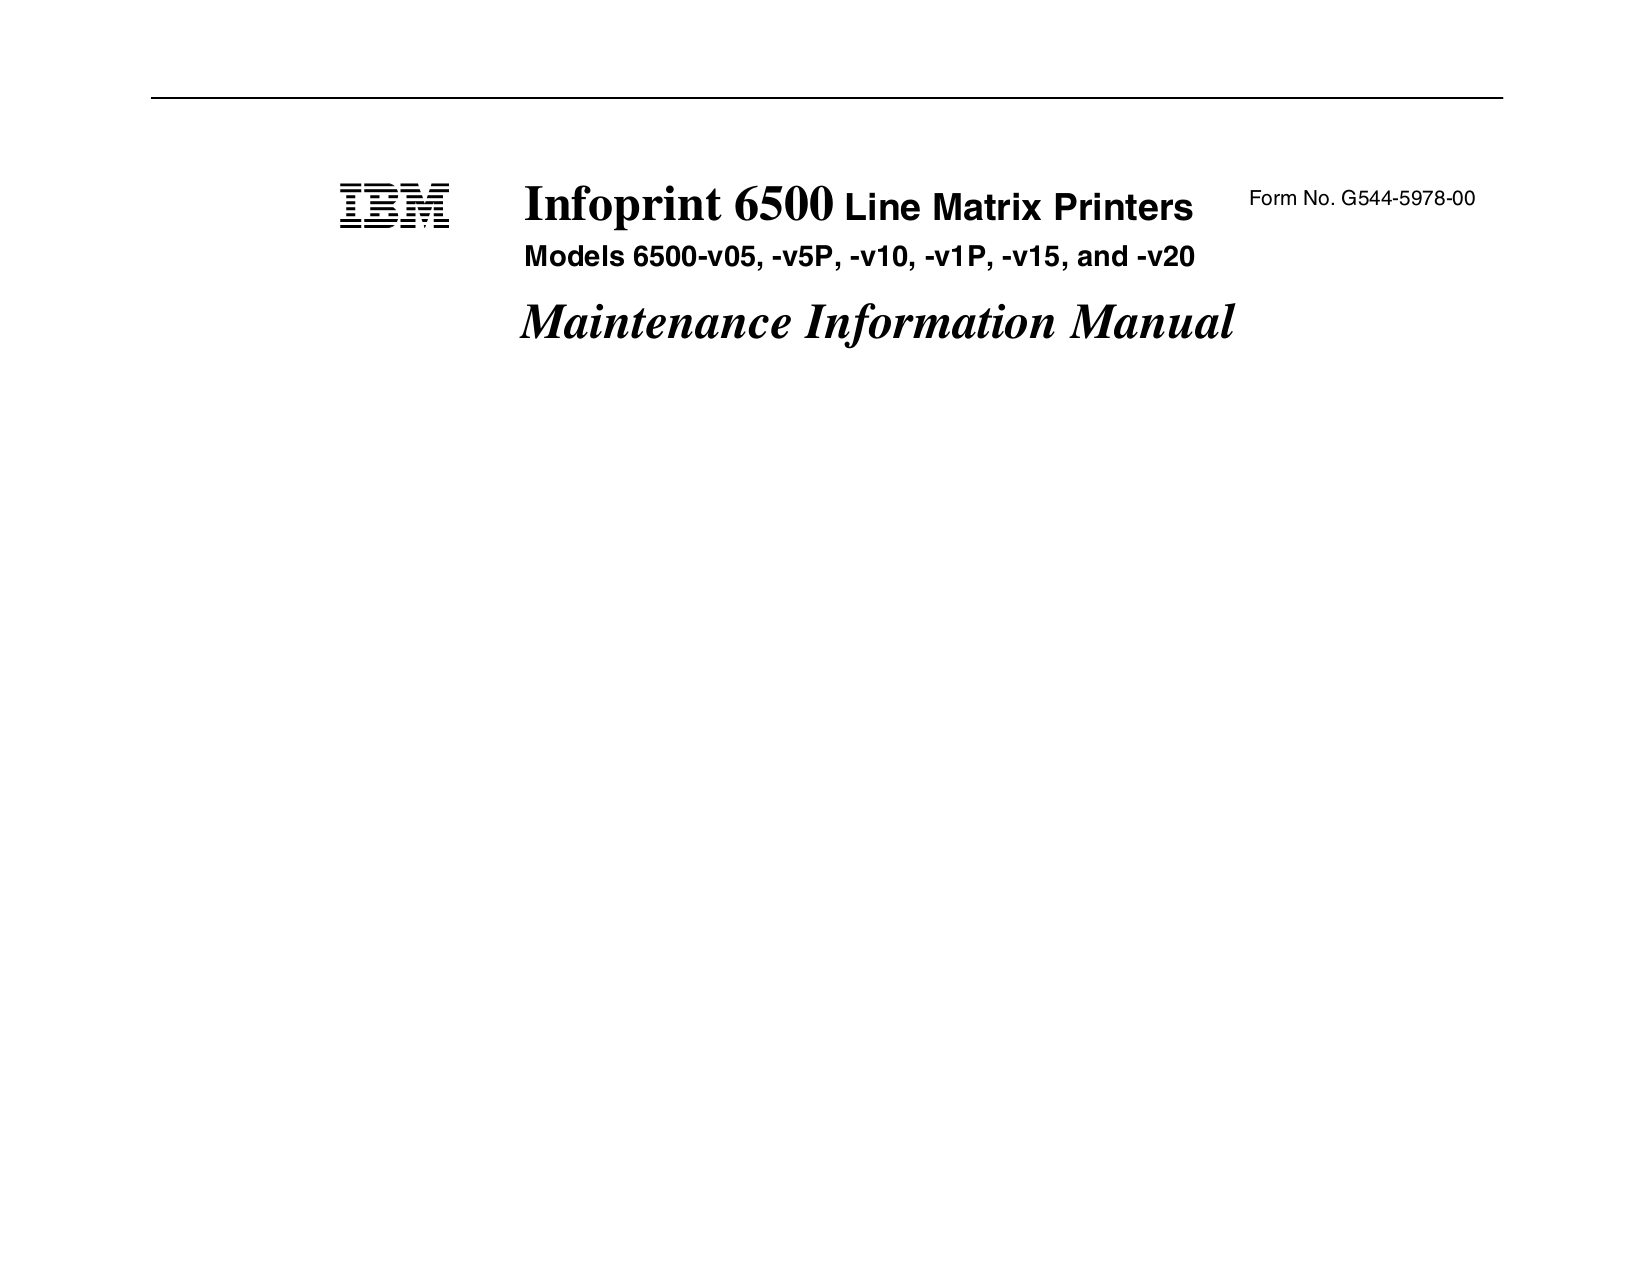 ibm printer service manual how to and user guide instructions u2022 rh taxibermuda co ibm 6400 printer manual pdf IBM Office System 6 Printer with Dual Paper Trays